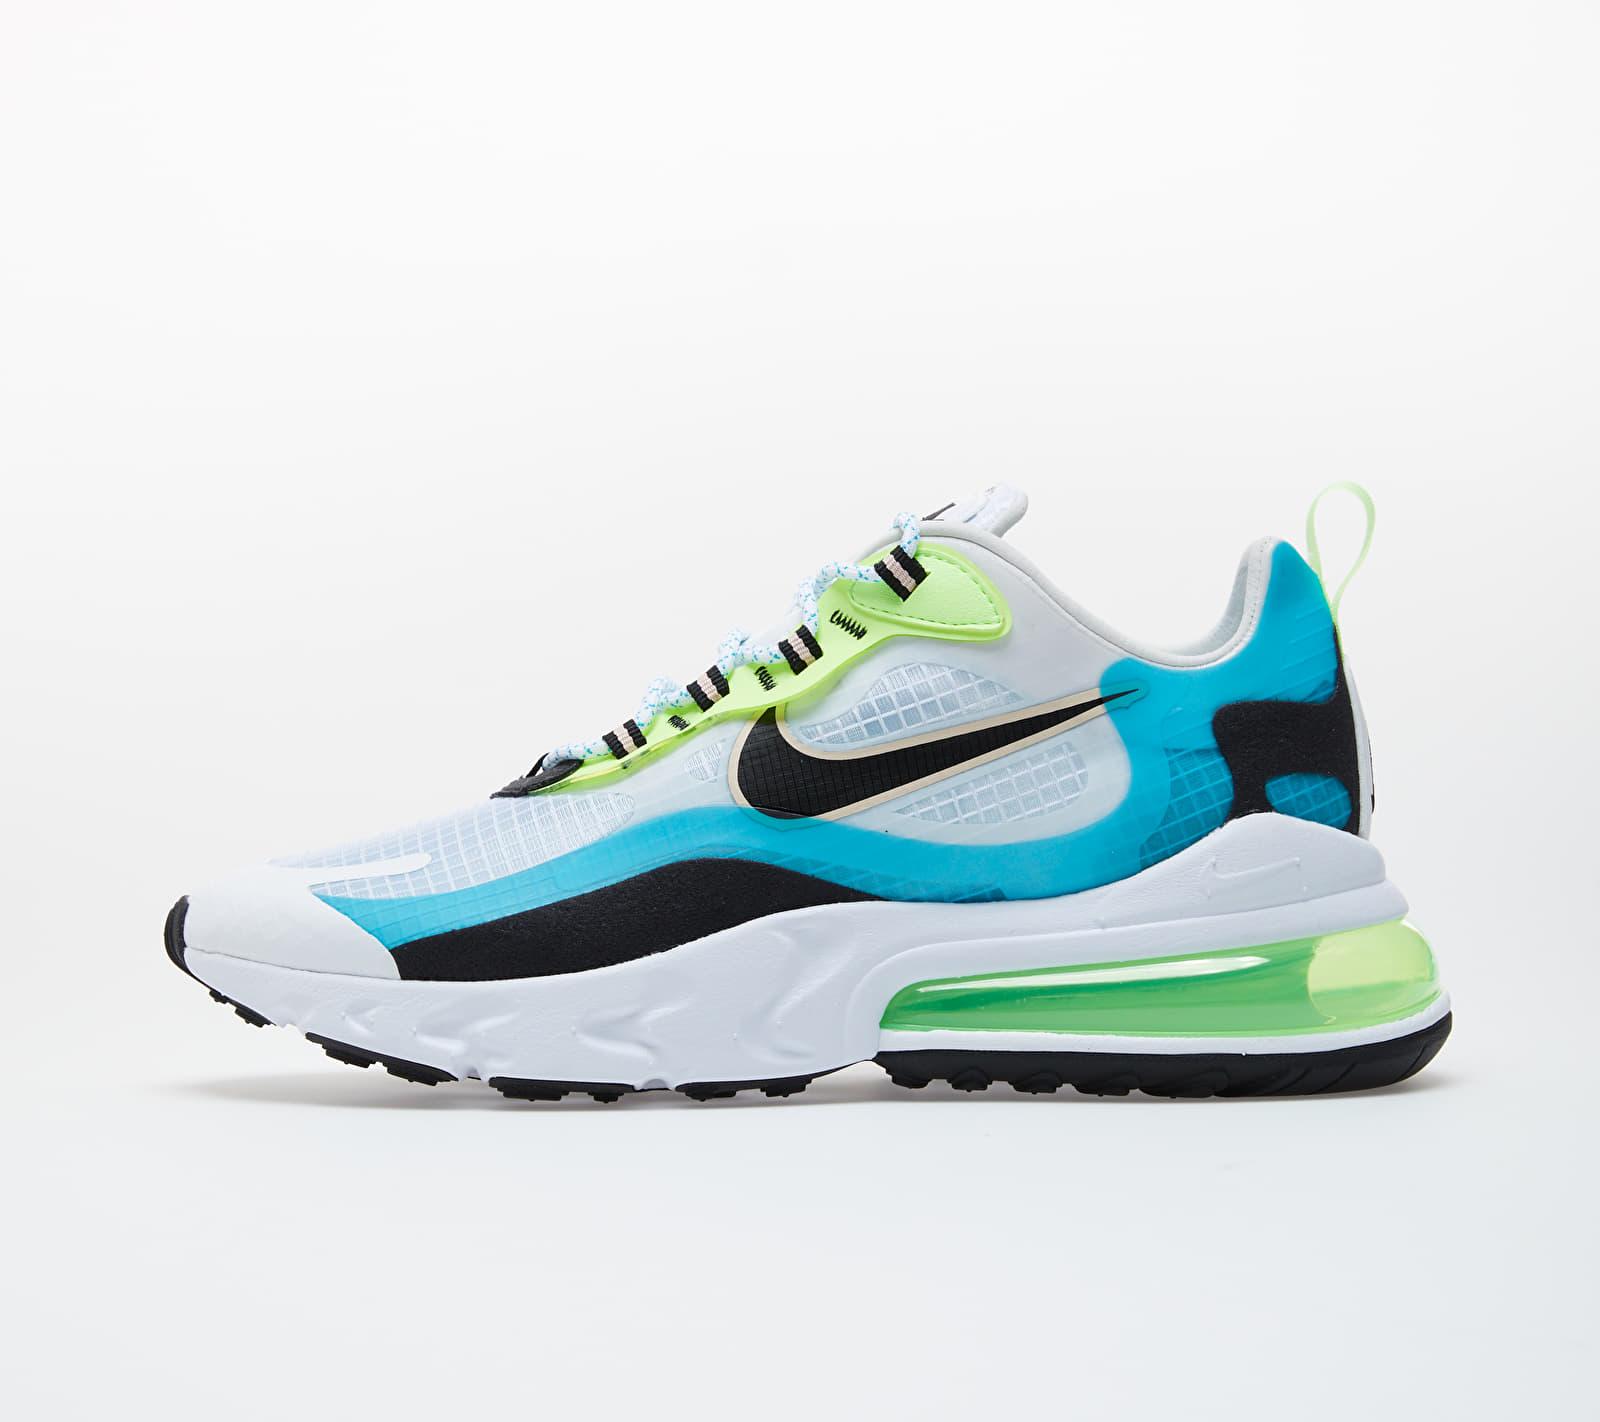 Nike Air Max 270 React SE Oracle Aqua/ Black-Ghost Green CT1265-300